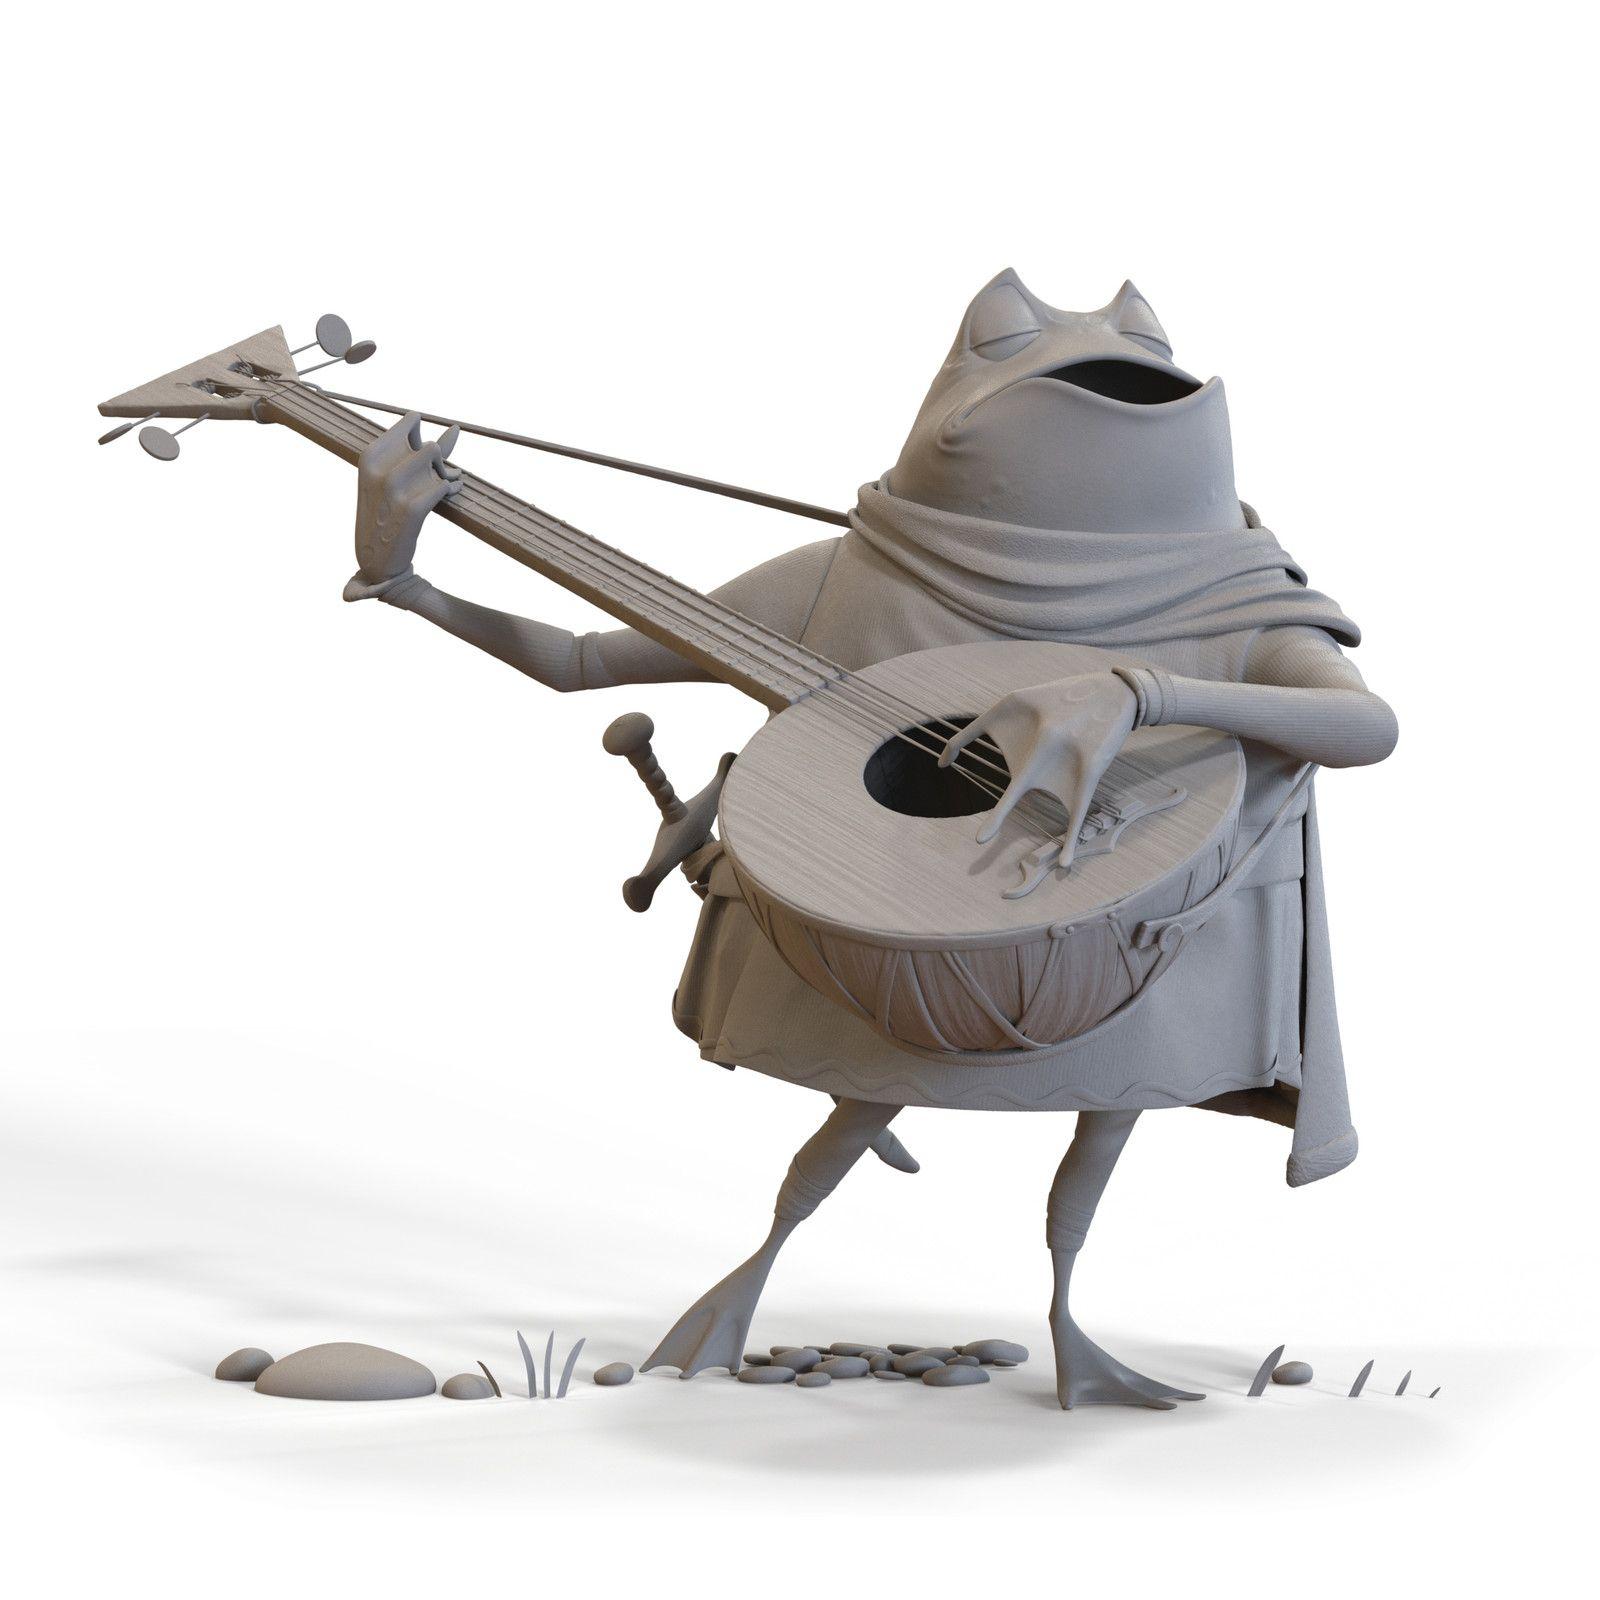 Singing Frog, Christopher Wright on ArtStation at https://www.artstation.com/artwork/21mlK